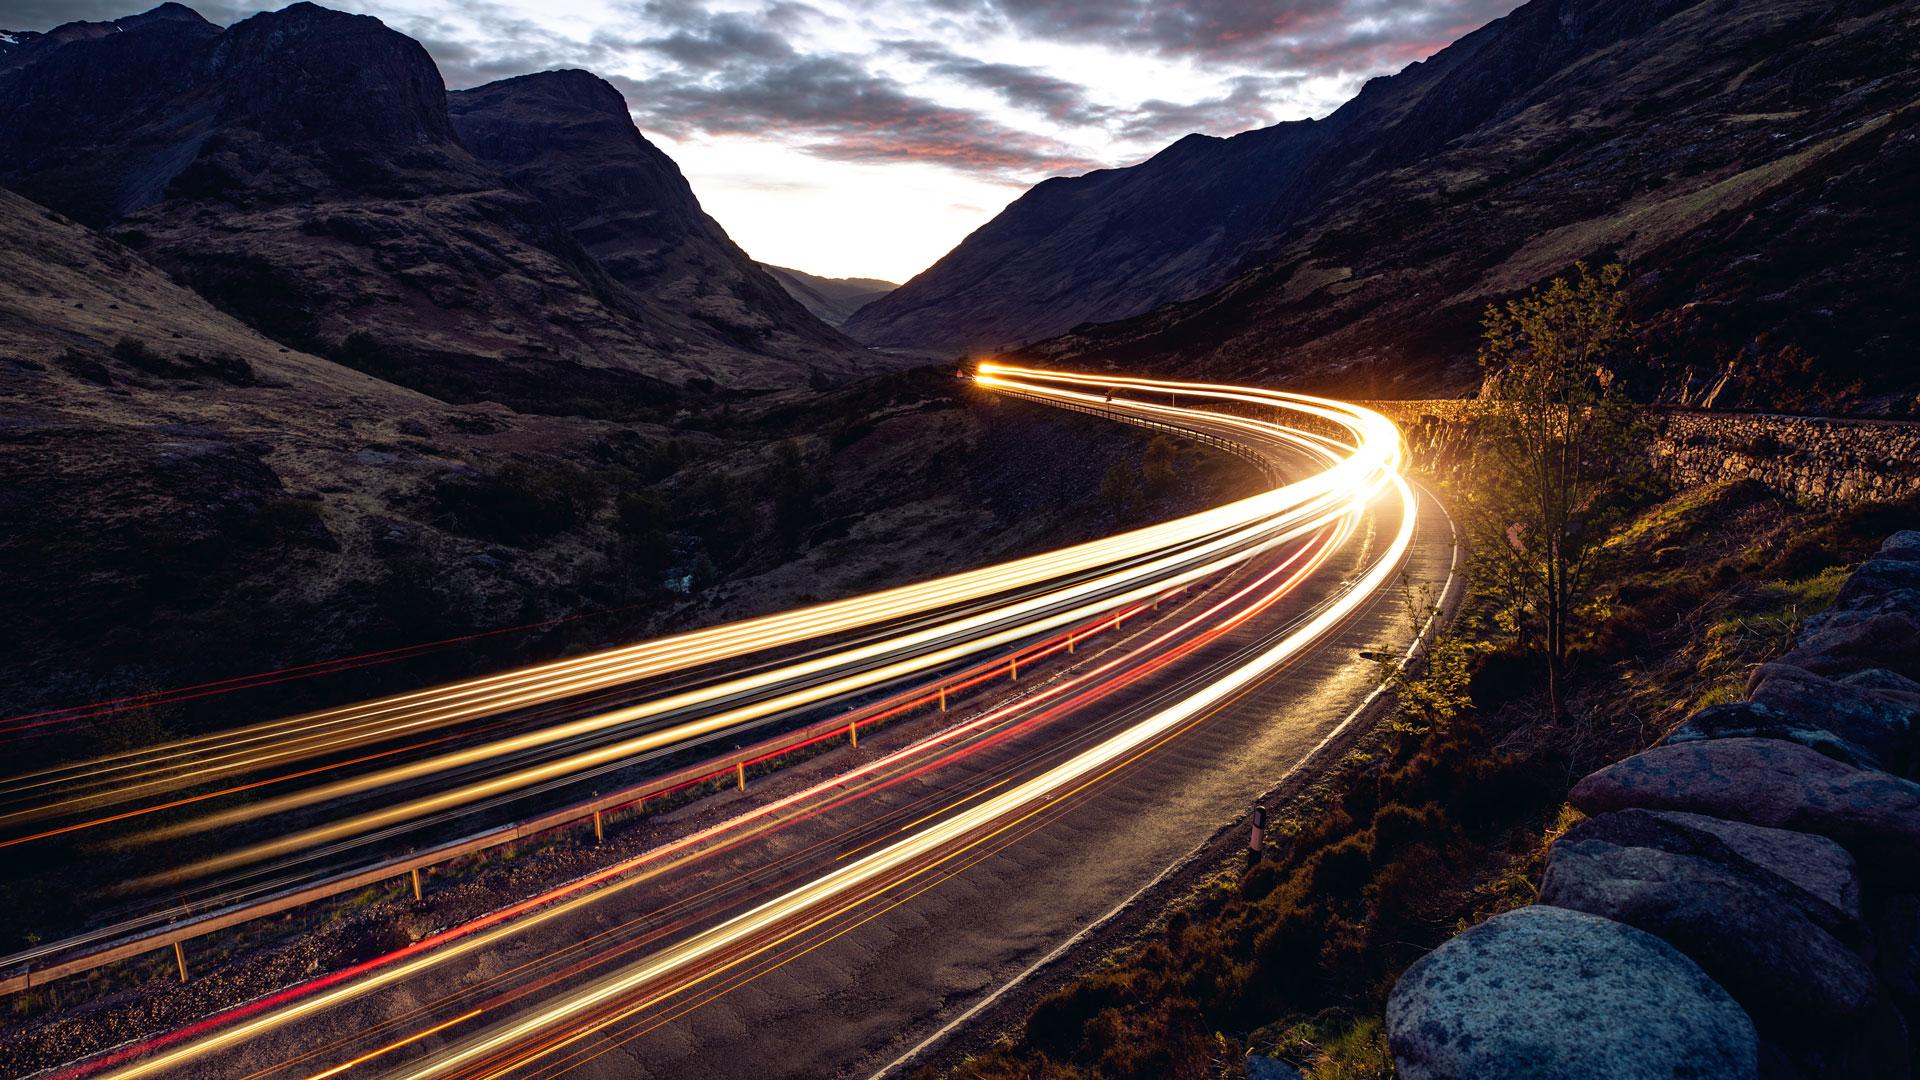 road illuminated at night